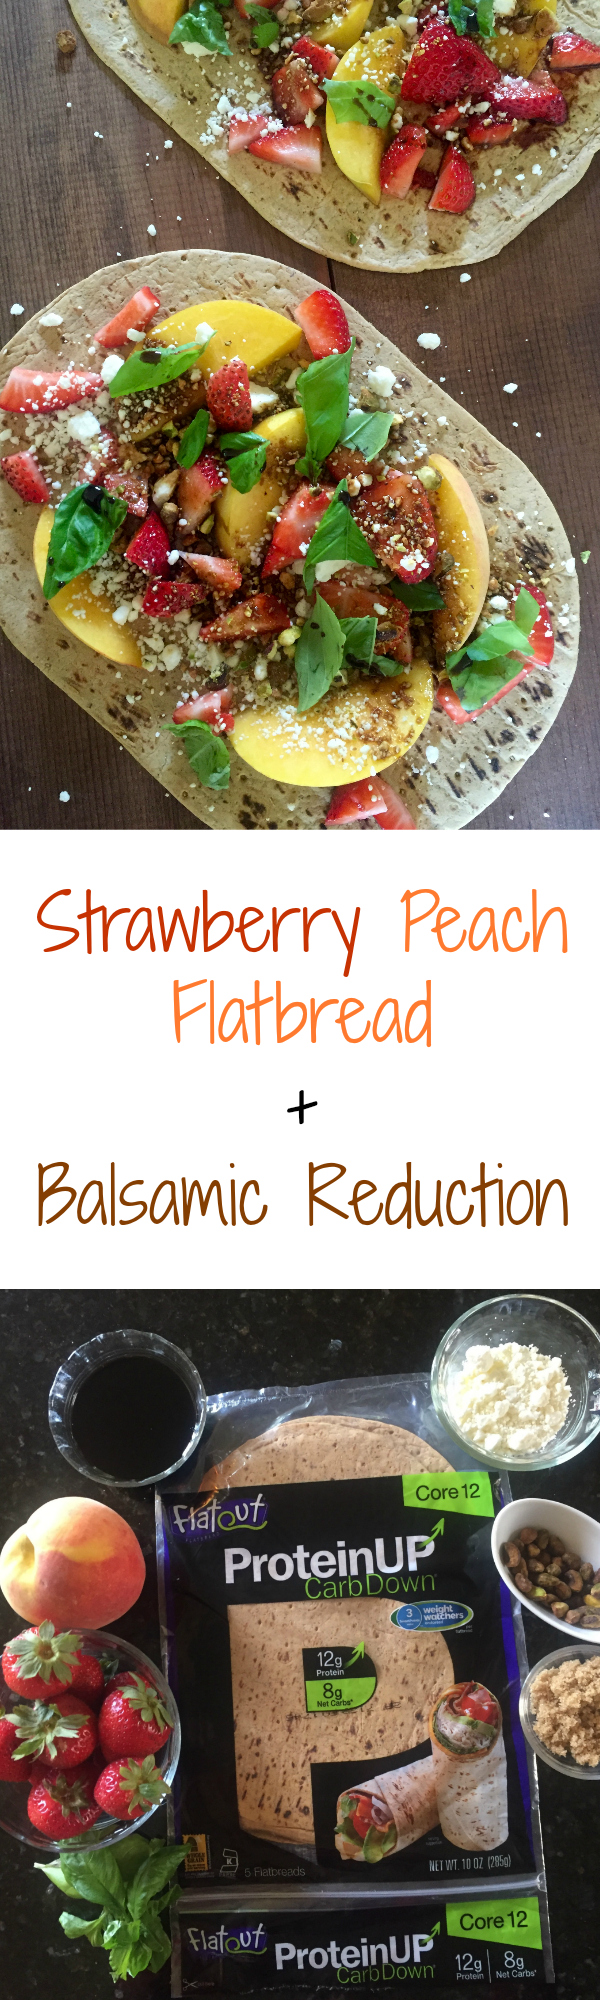 Strawberry Peach Flatbread